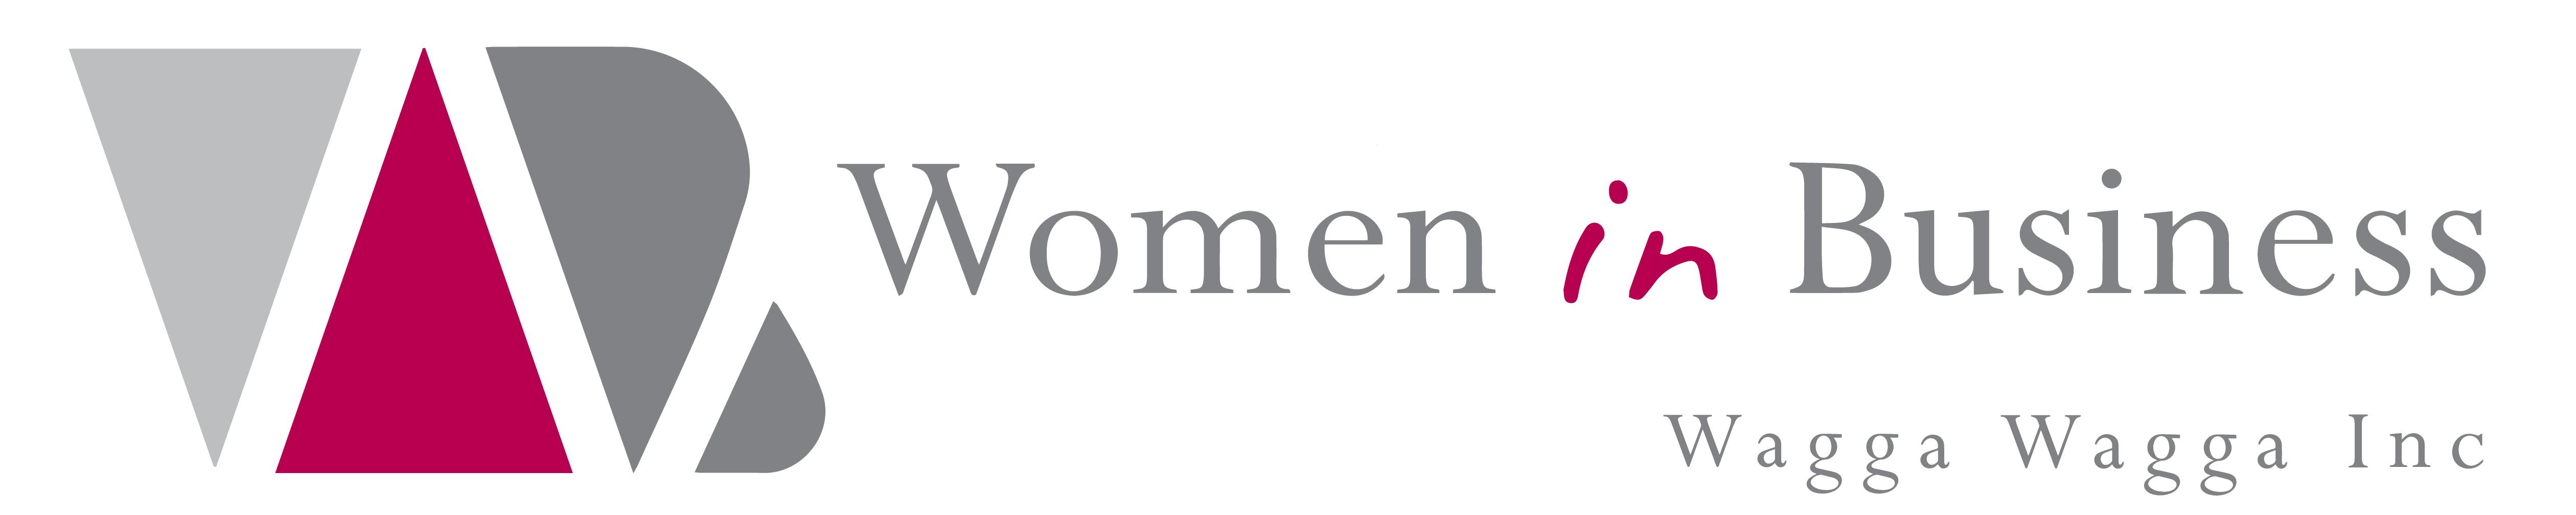 Women in Business Wagga Wagga Survey